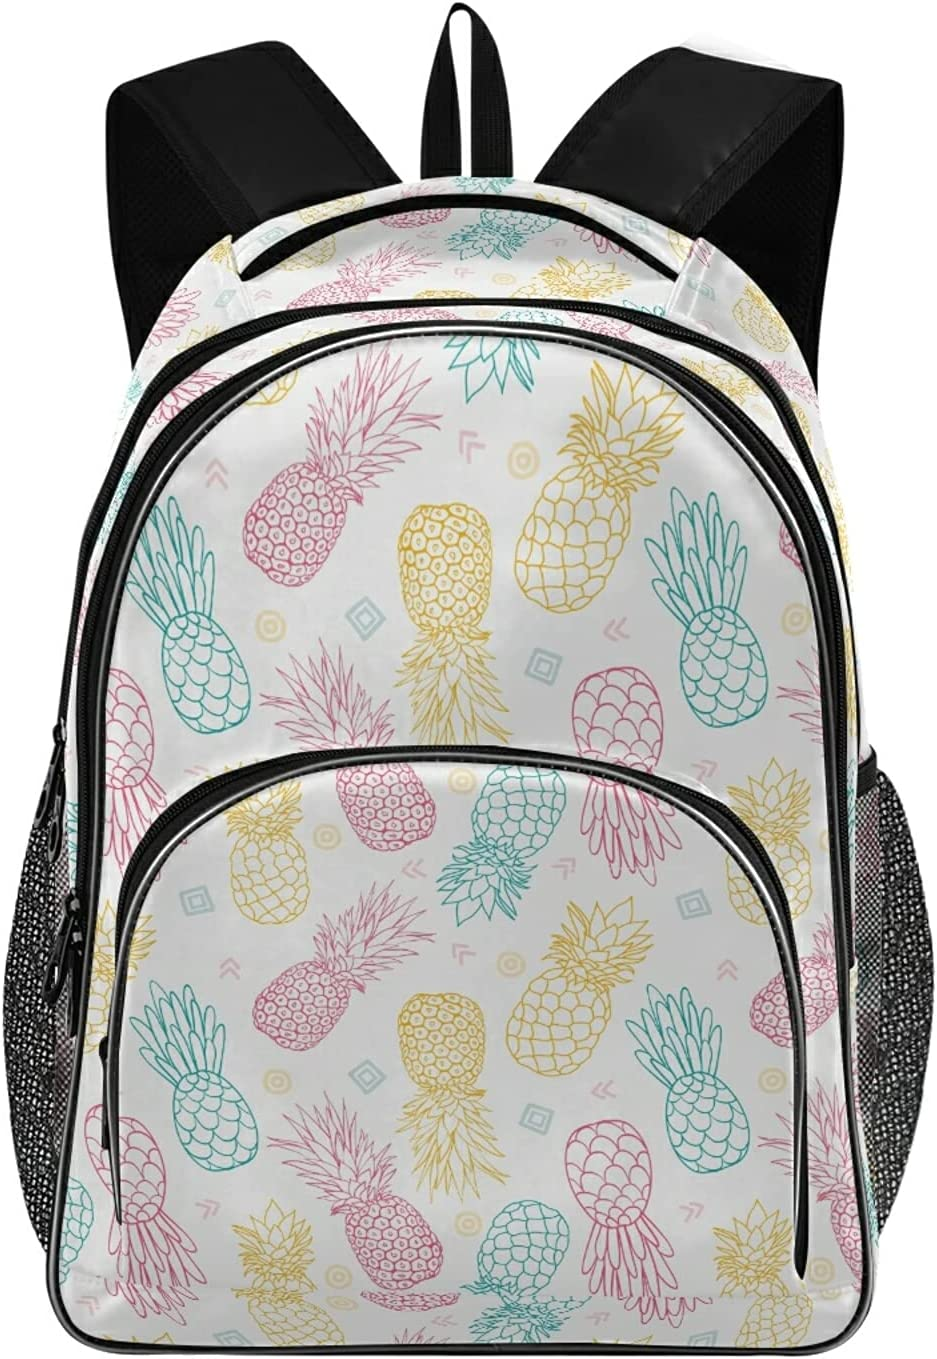 School Max 53% OFF Backpack Sales for sale Bookbag Laptop Daypack Schoolbag Women Teens